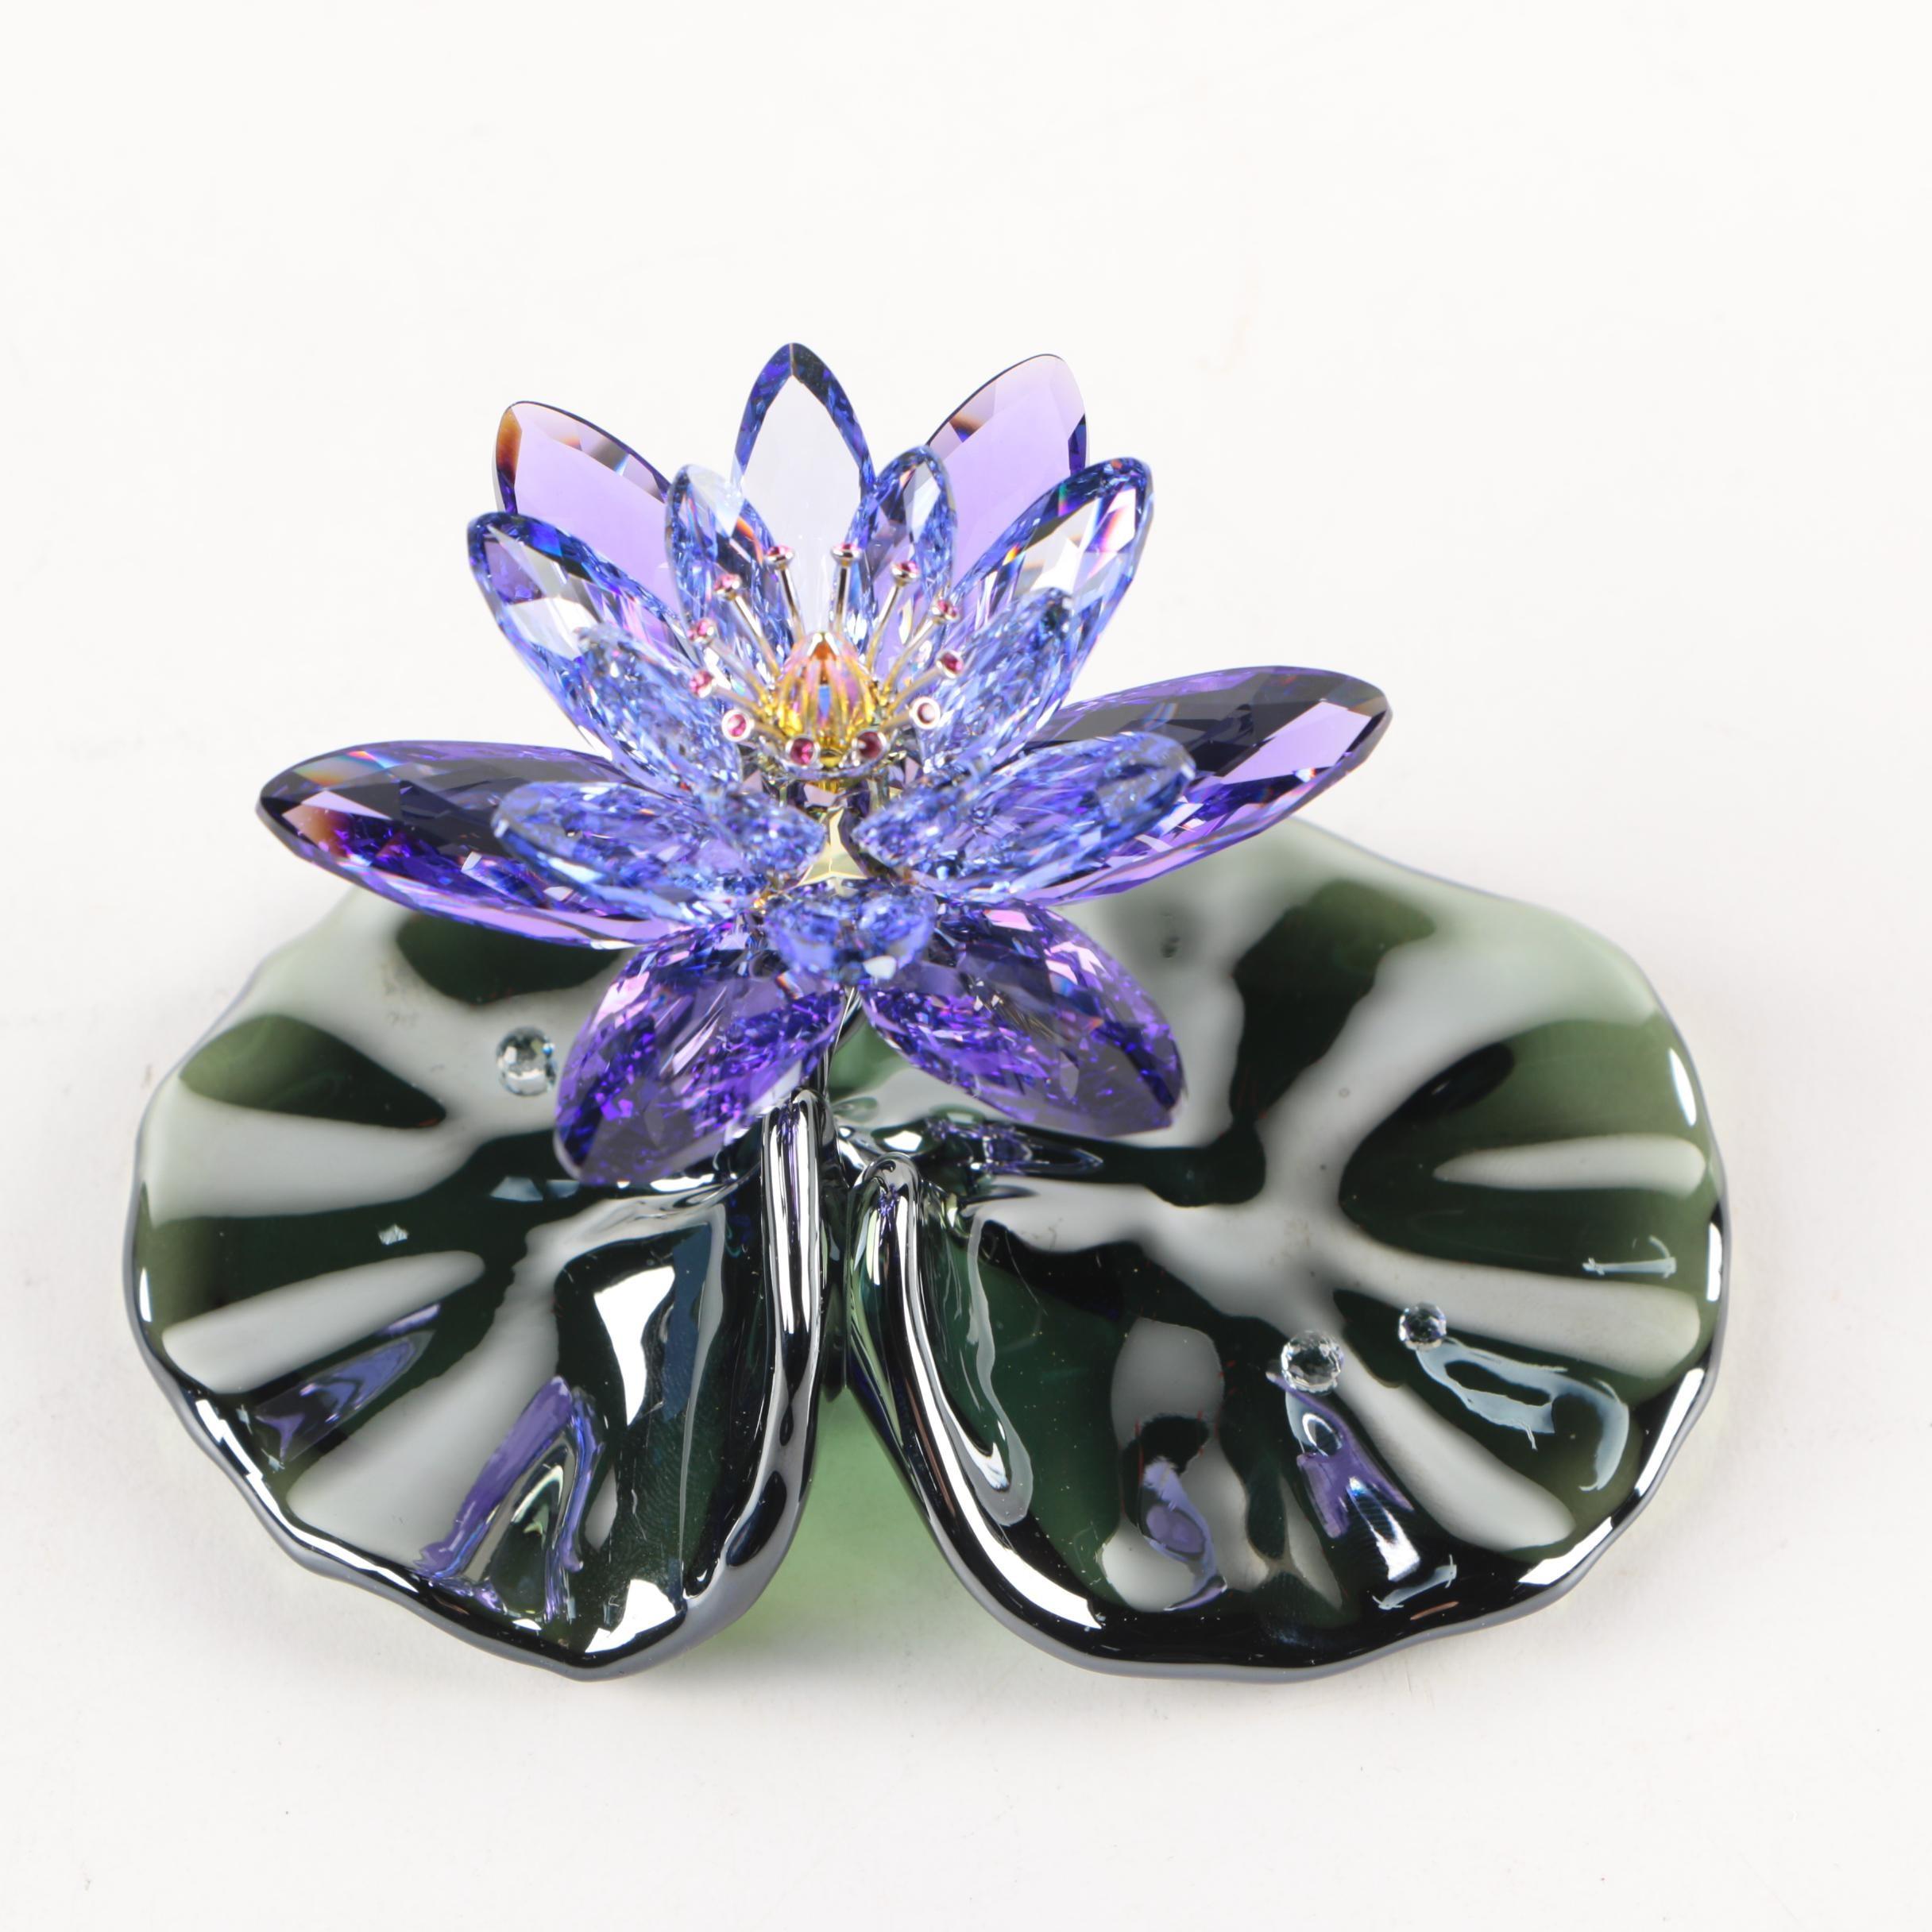 "Swarovski ""Waterlily Blue Violet"" Crystal Flower"